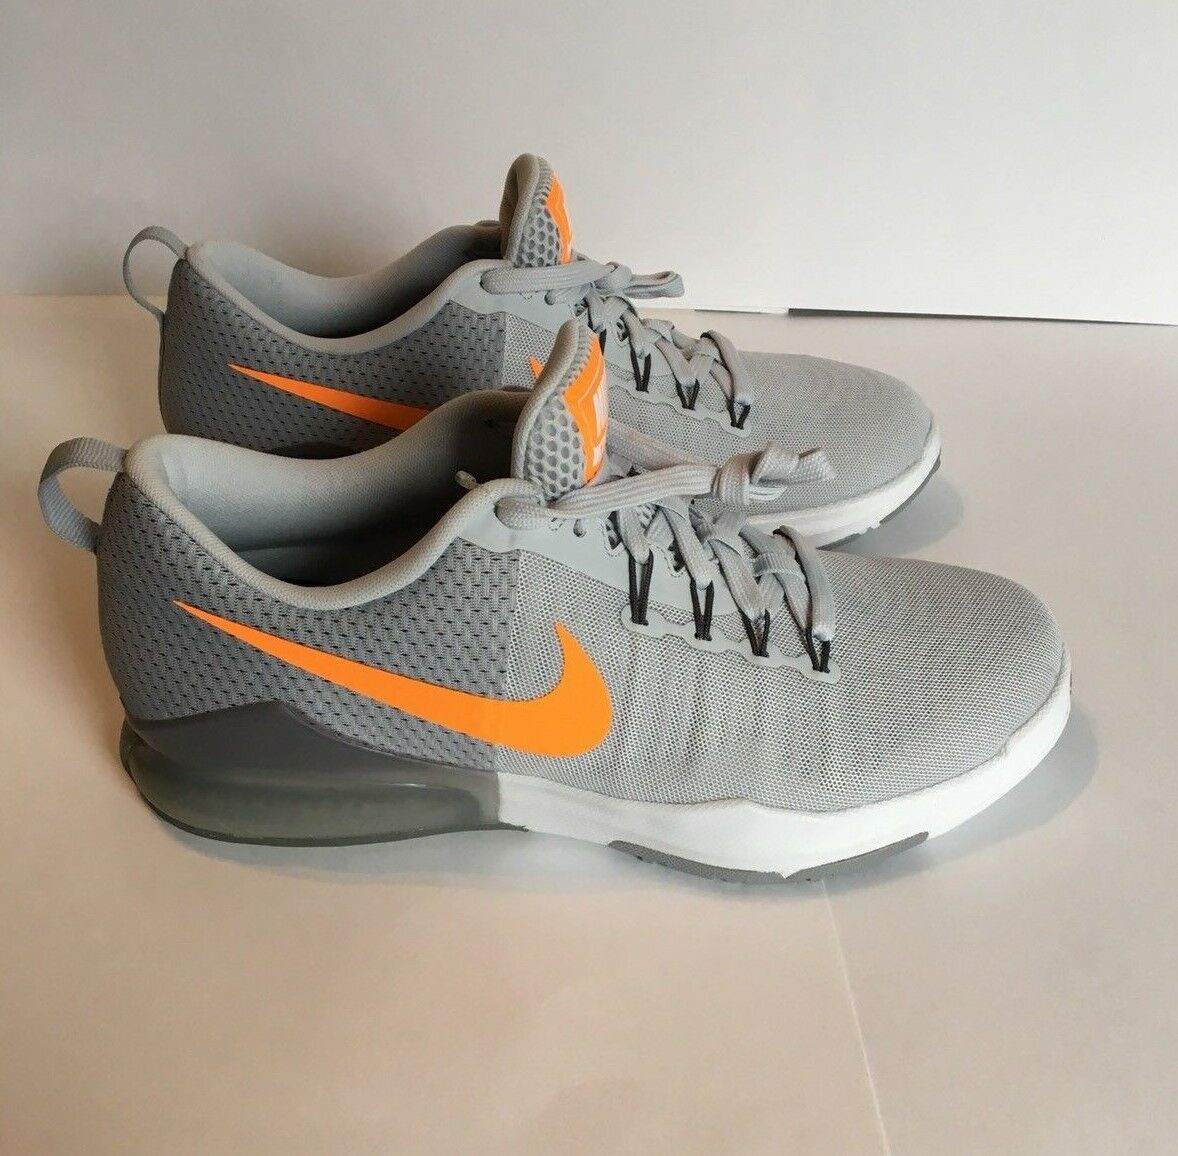 NIKE MEN'S  ZOOM TRAIN ACTION Shoes (Pure Platimum/Orange) Size 8.5  (B) Grade